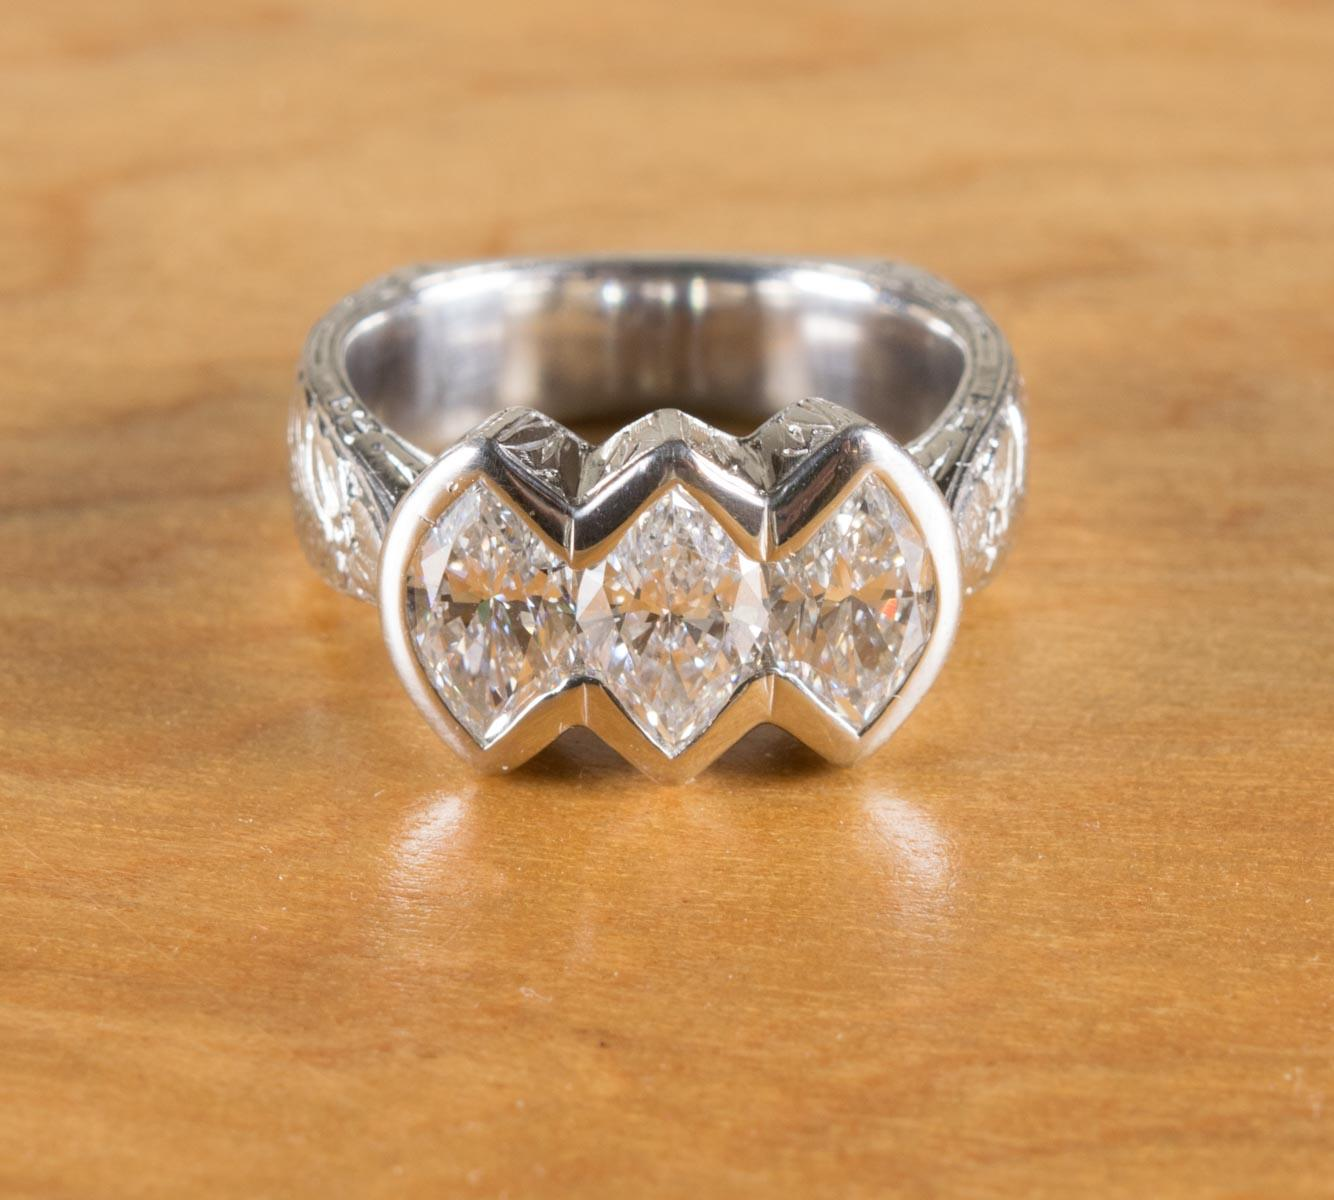 DIAMOND AND PLATINUM THREE-STONE RING. The heavy